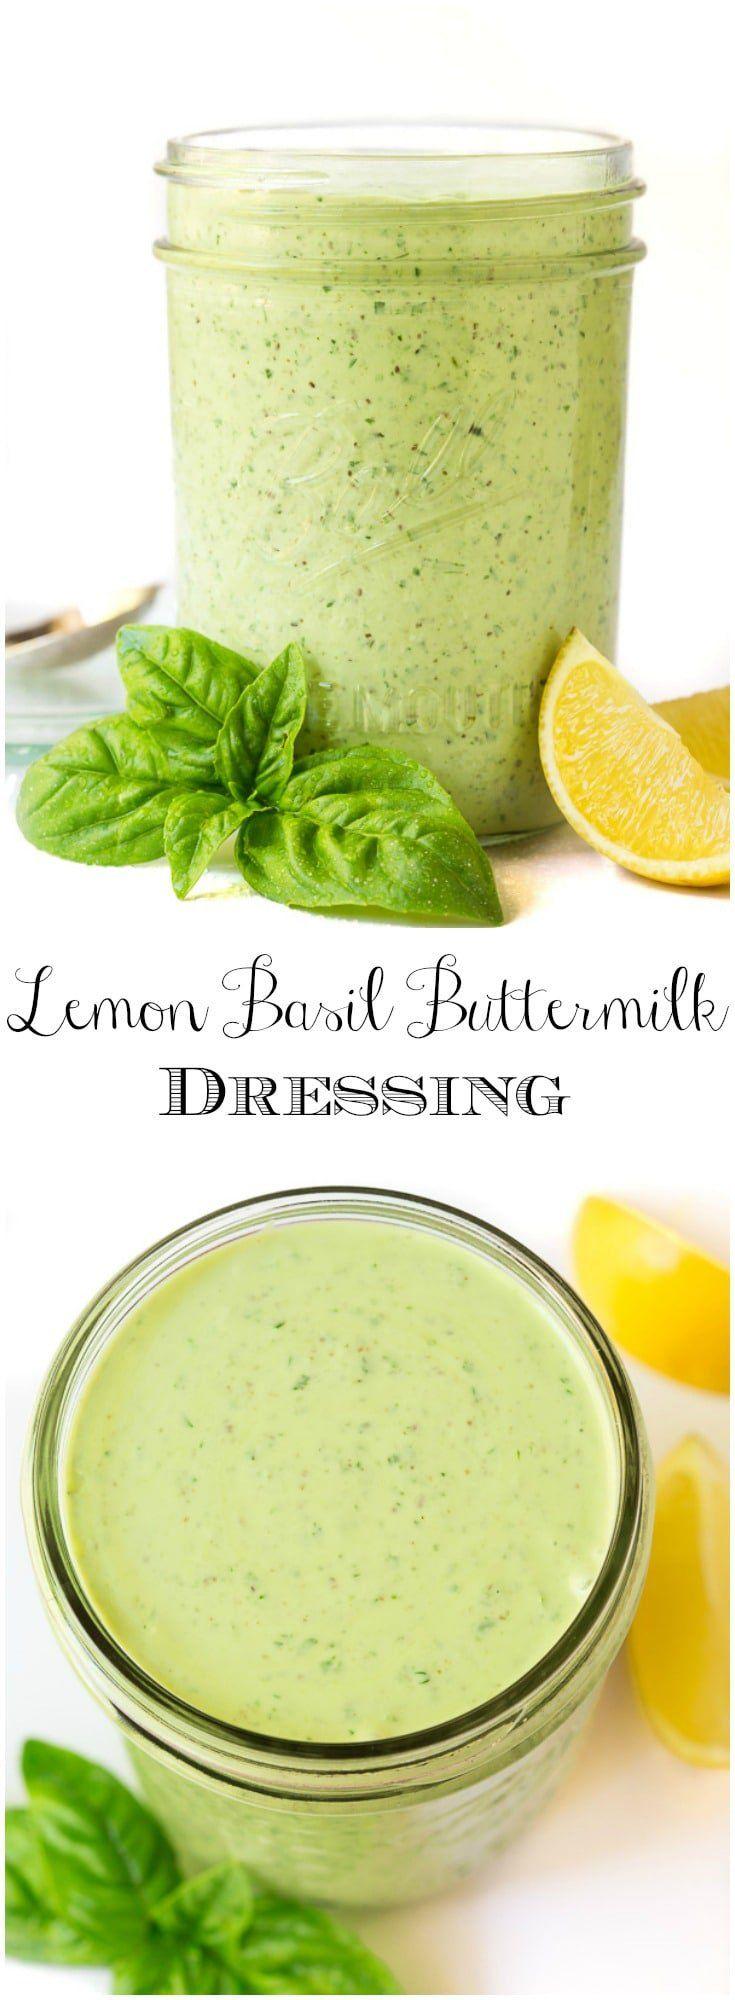 Lemon Basil Buttermilk Dressing Recipe Dressing For Fruit Salad Buttermilk Dressing Lemon Basil